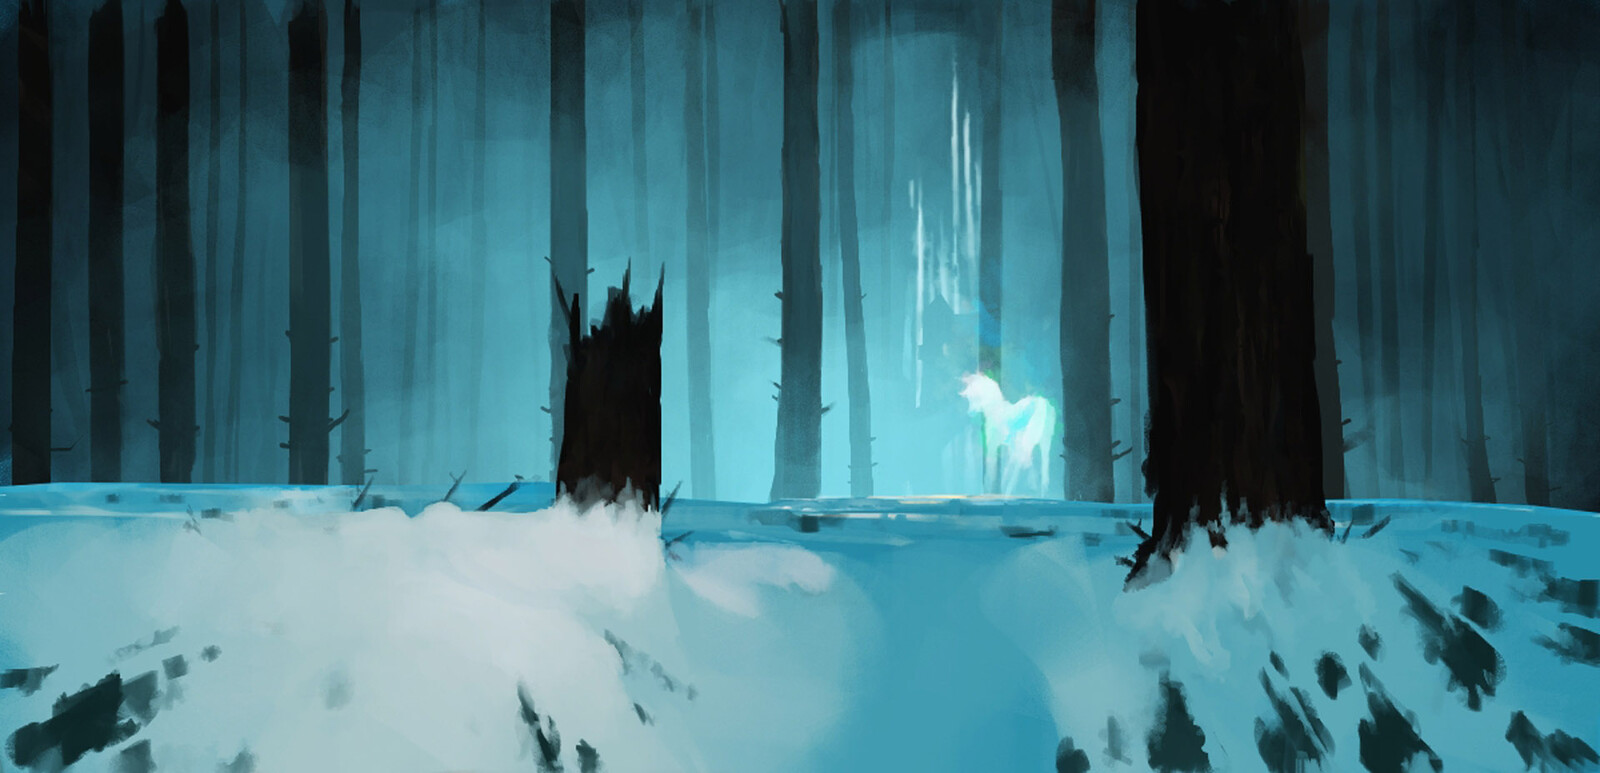 Inktober2019 - Day 7 - Enchanted